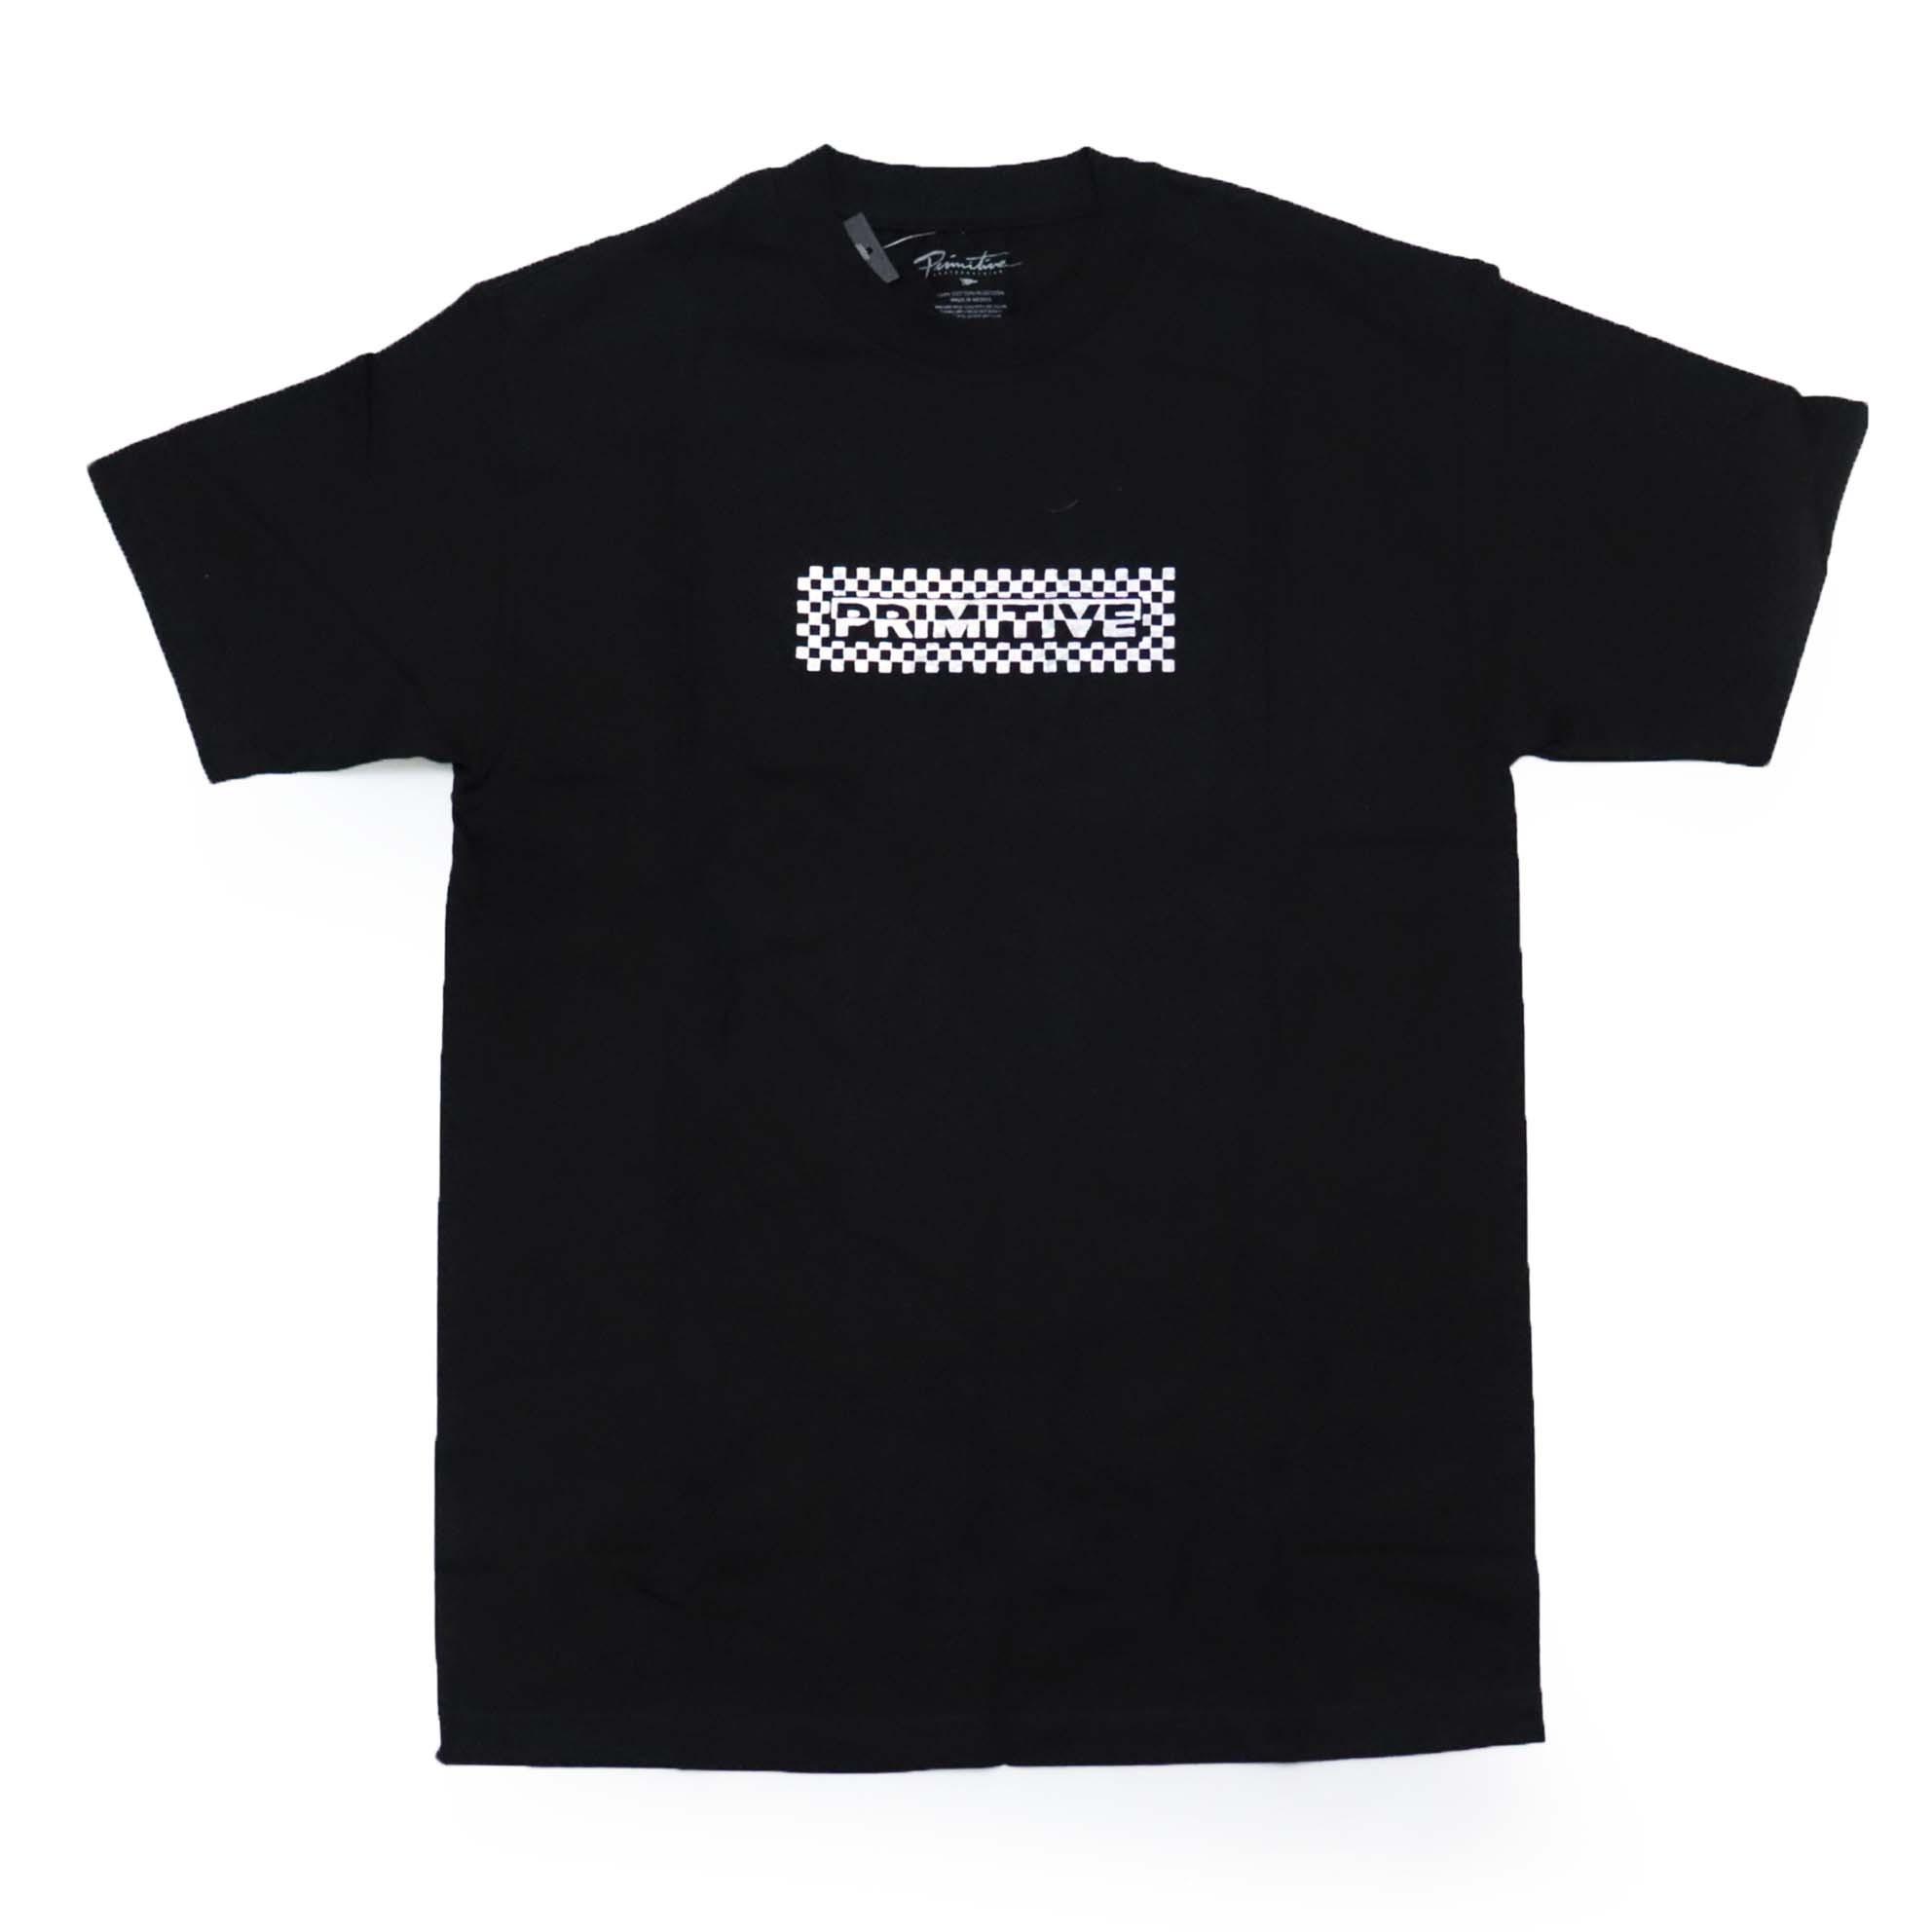 Camiseta Primitive Line Hologram - Preto (Estampa Holográfica/Importado)